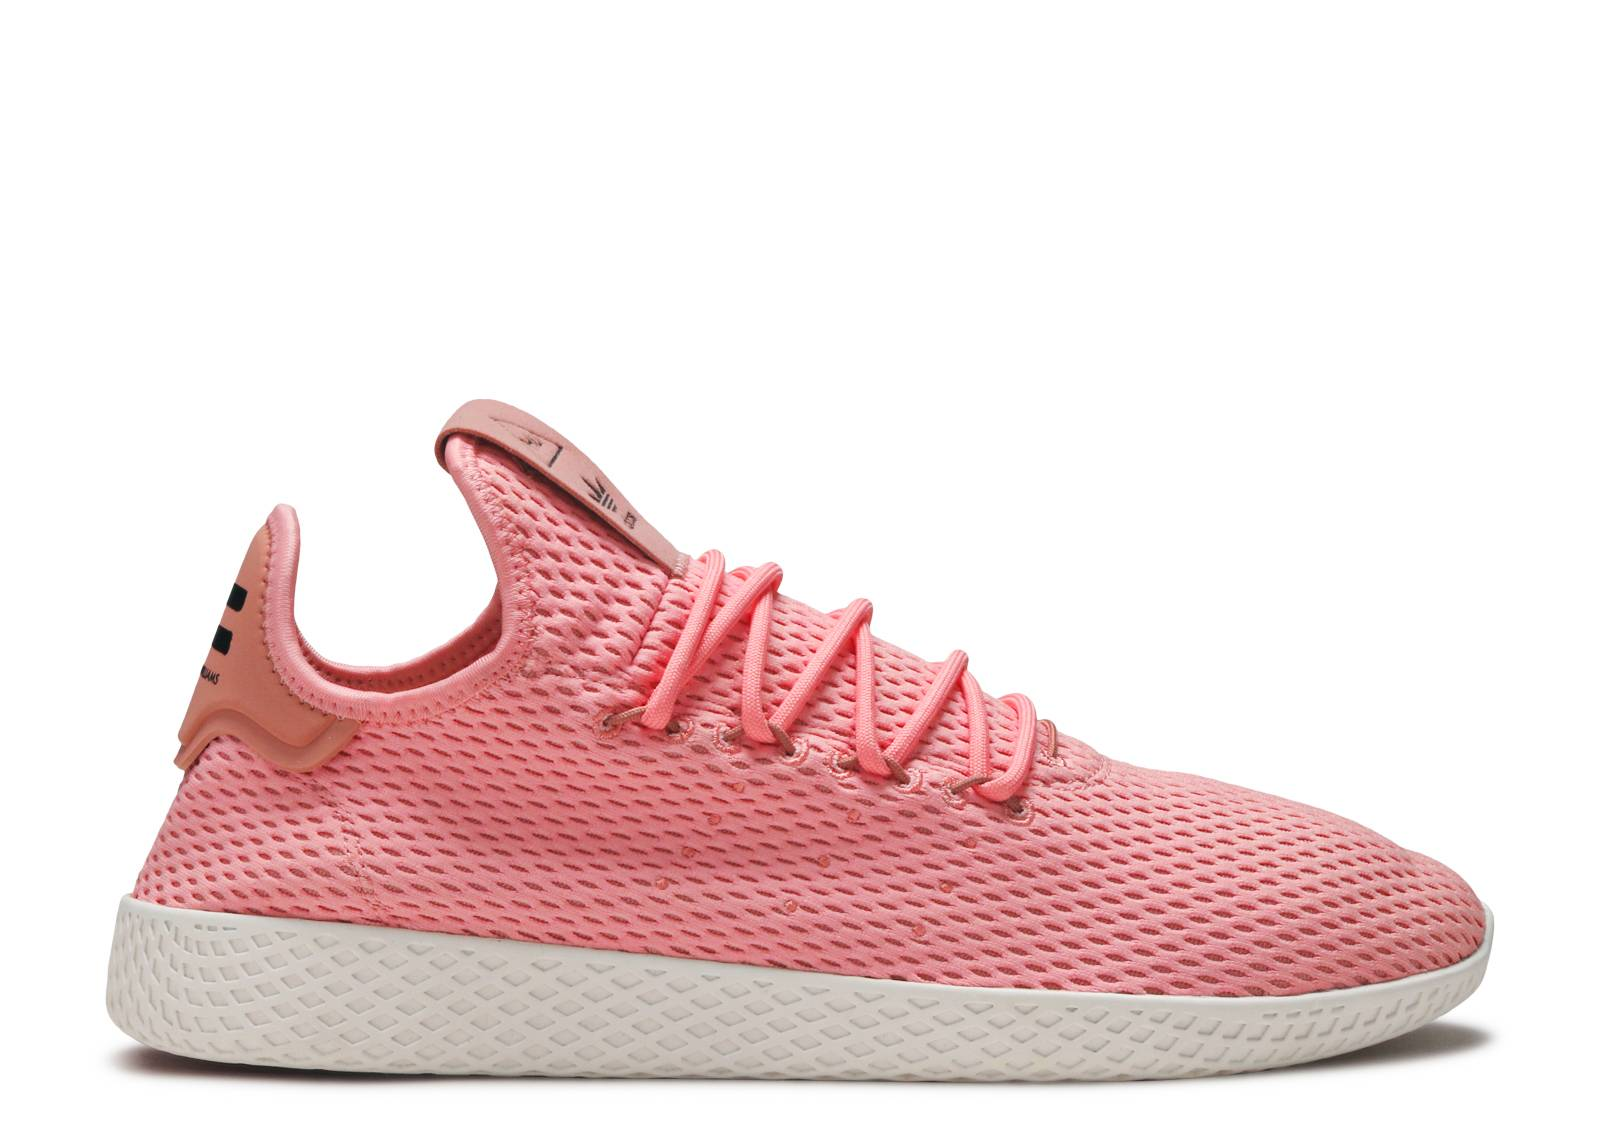 adidas hu tennis pink